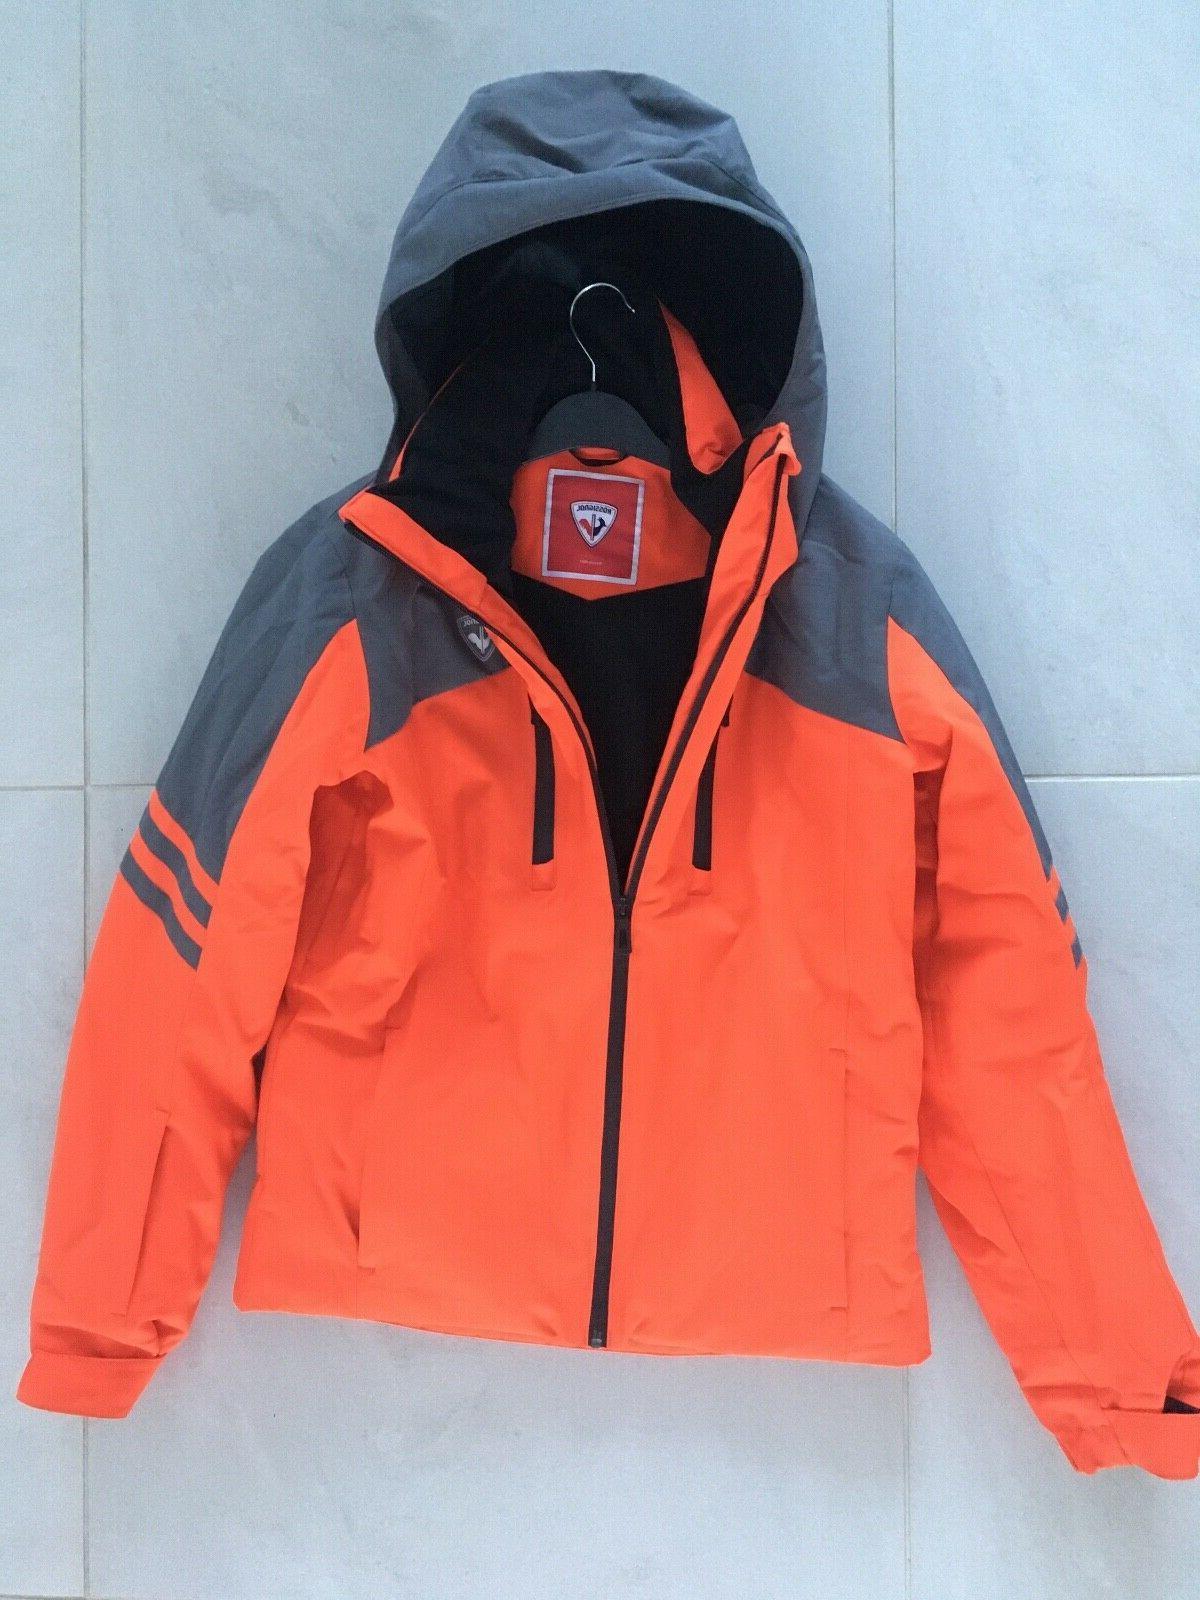 rossignol child ski jacket age 16 orange